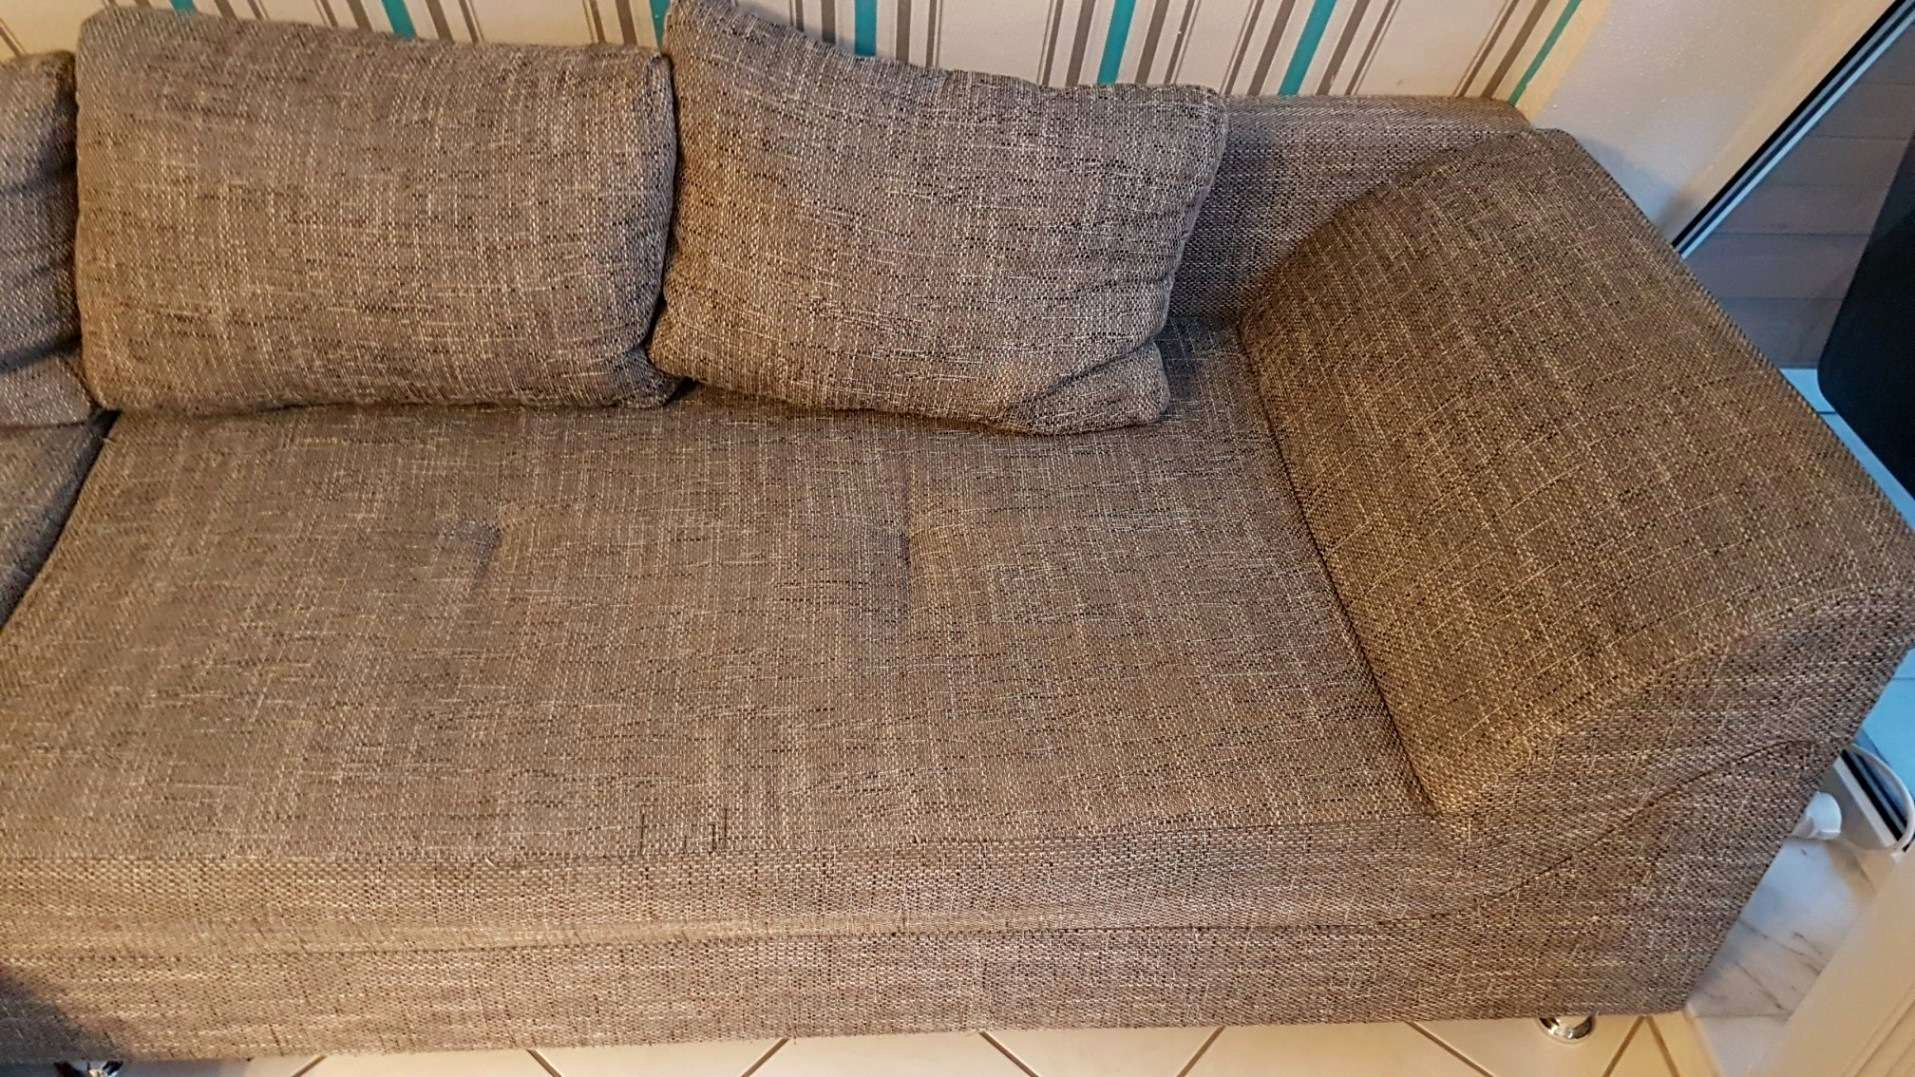 lounge liege garten genial couch liege luxus lounge sofa garten schon lounge balkonmobel 0d of lounge liege garten